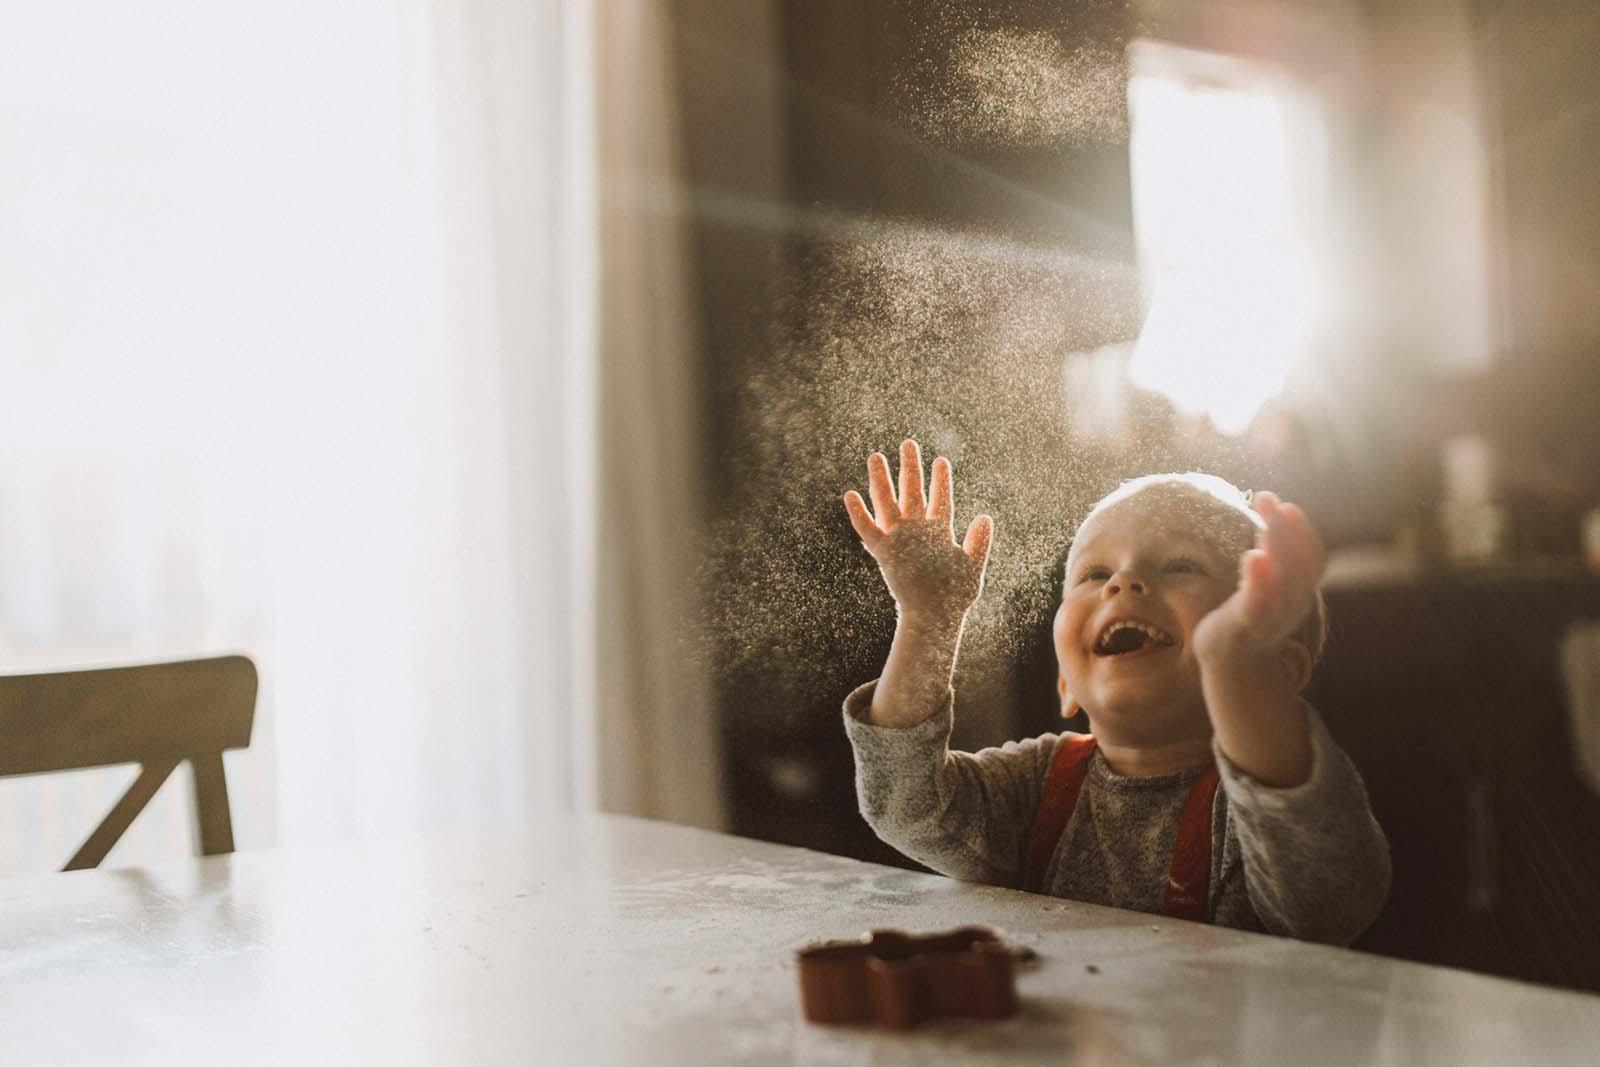 A joyful boy through a window. Finding balance with photography and motherhood